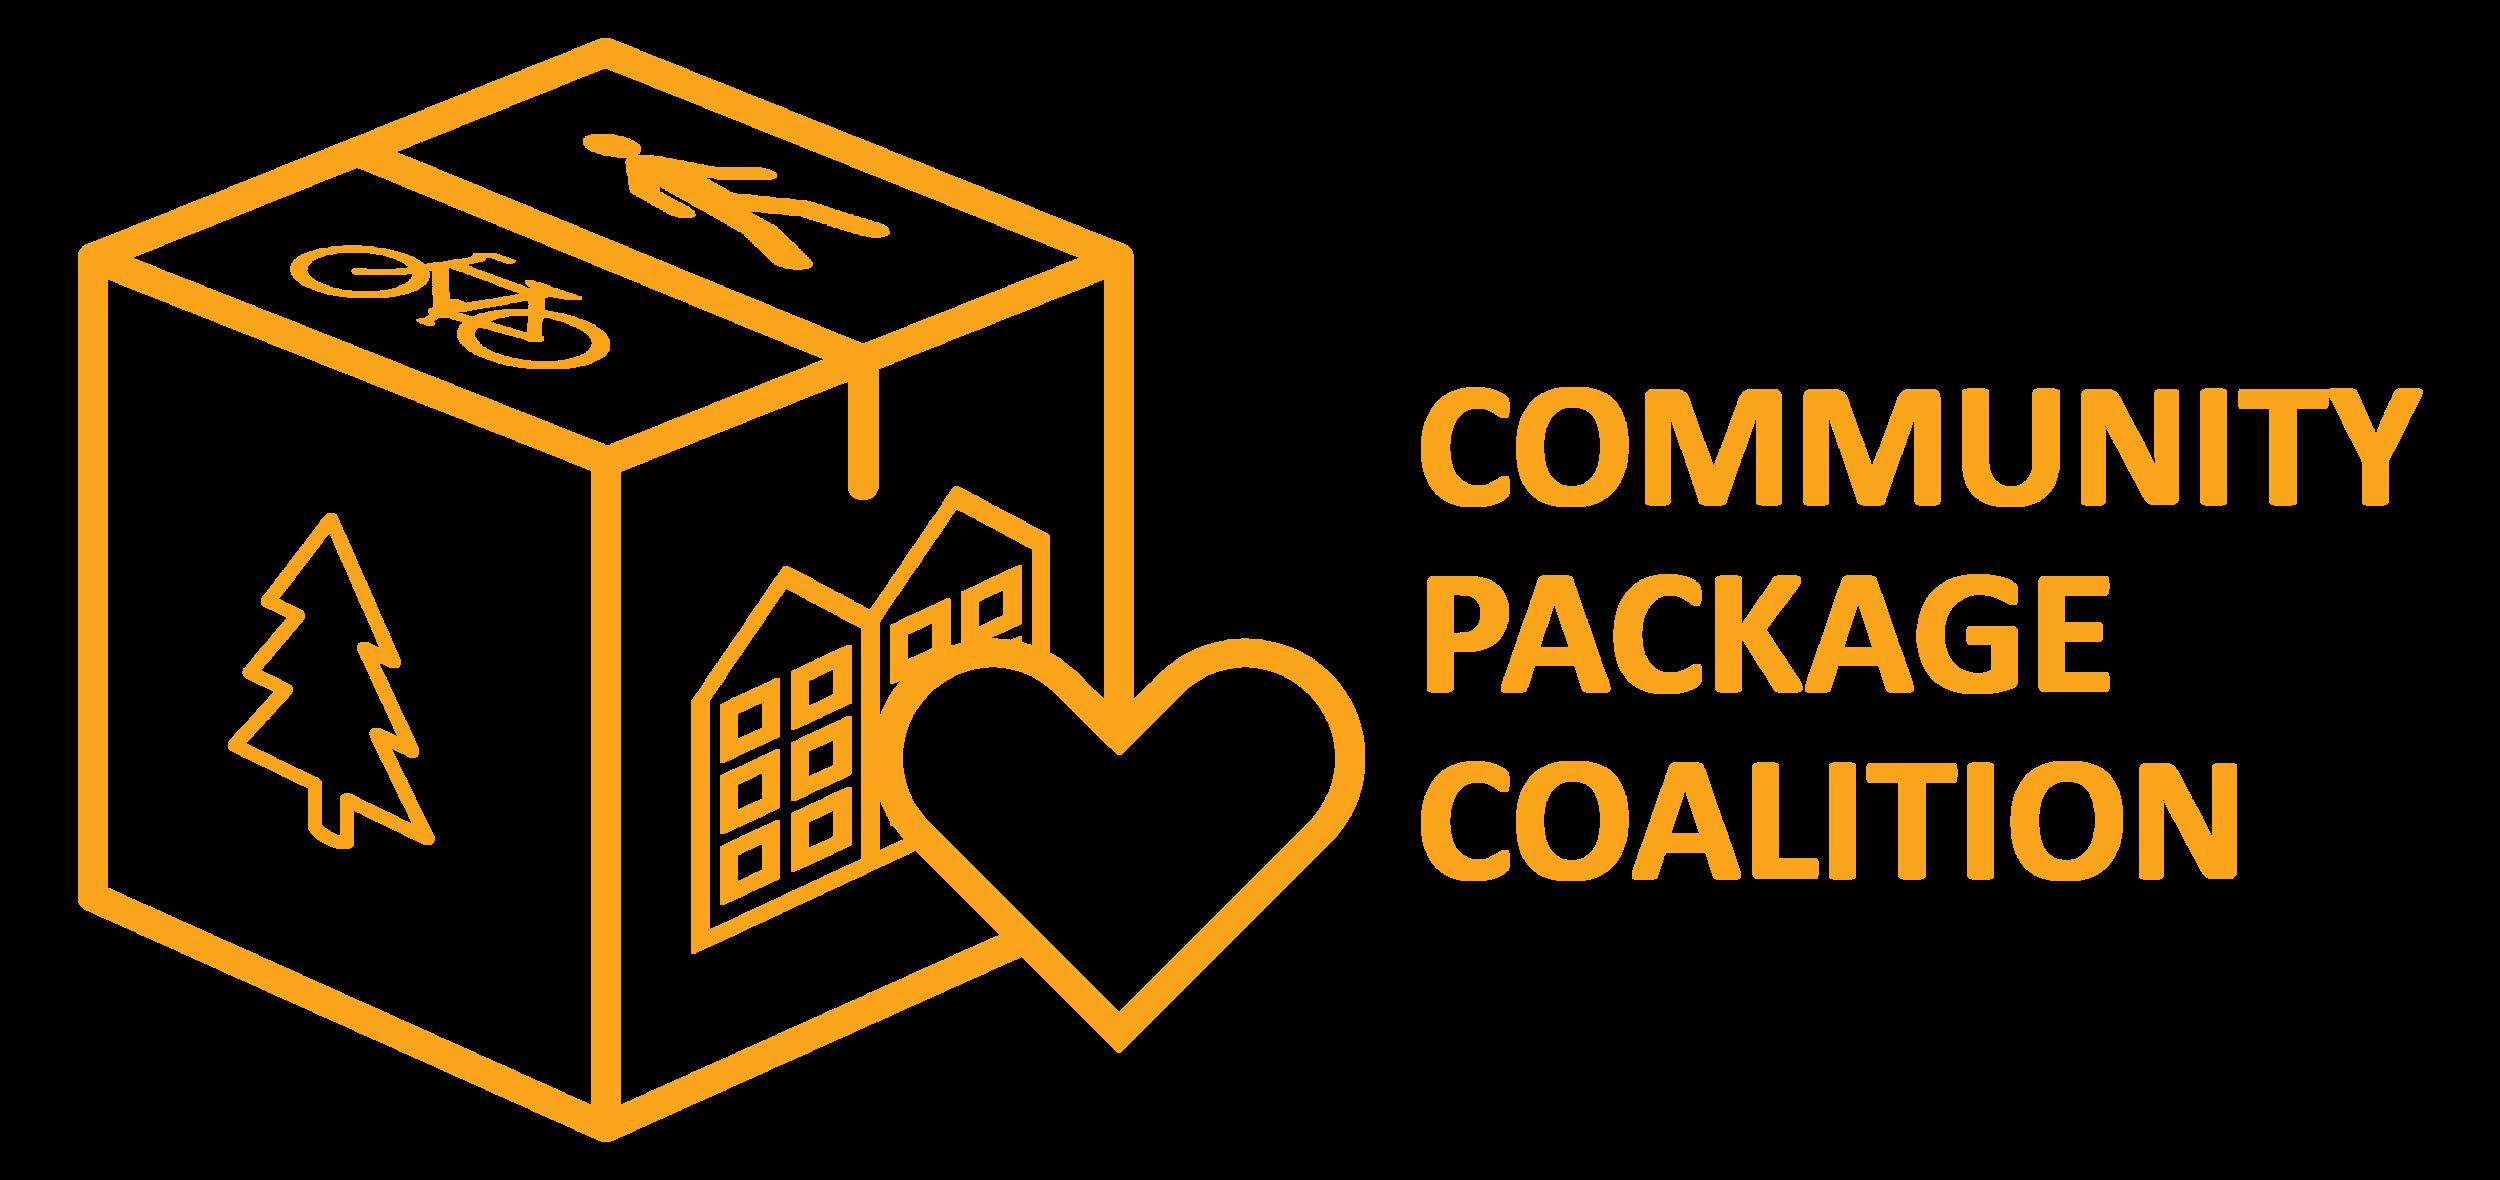 Community Package Logo_orange white background.png